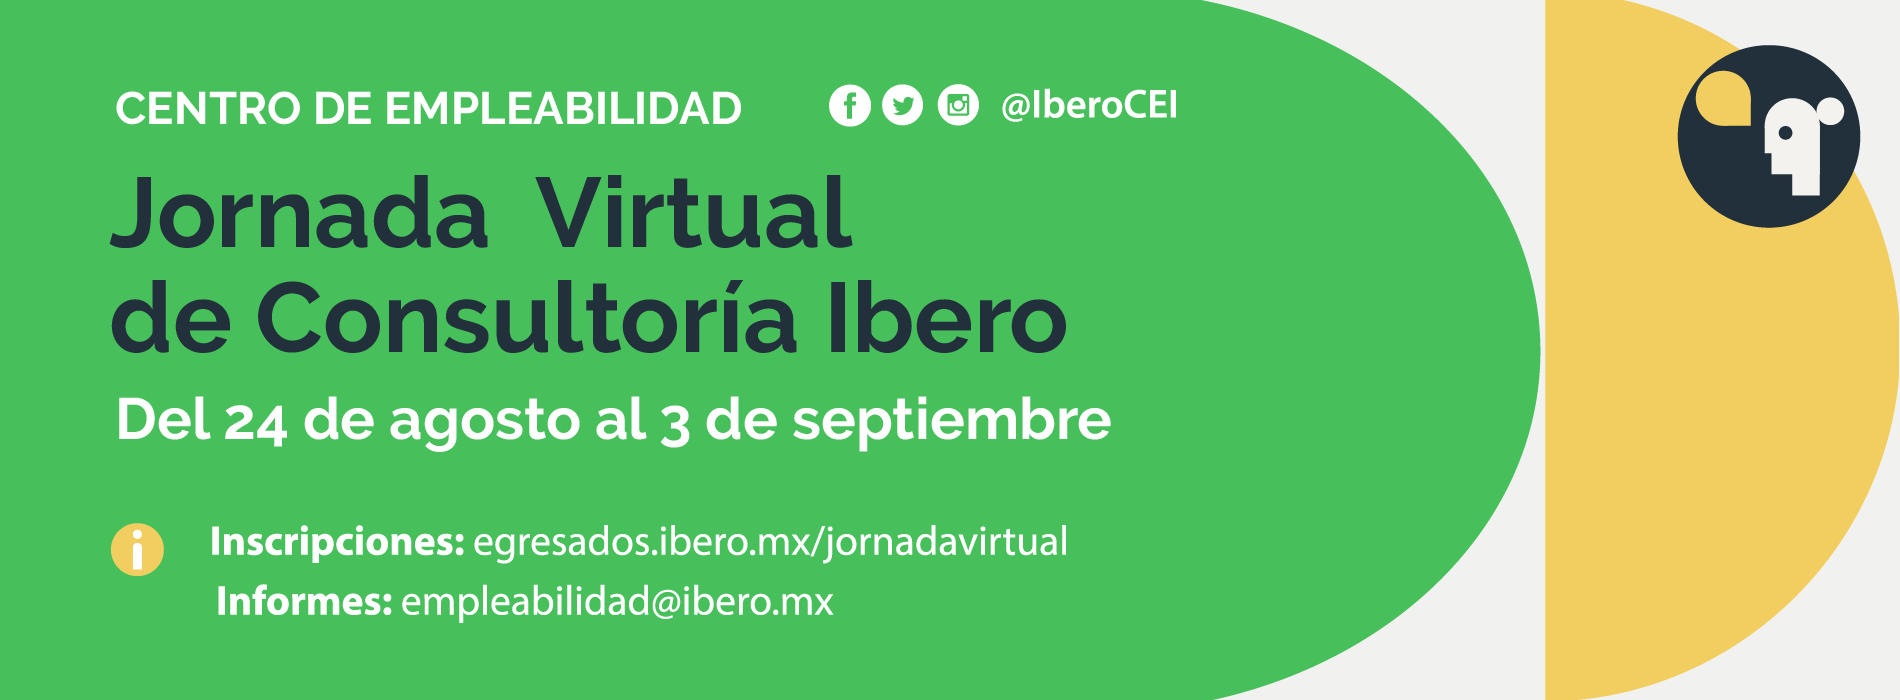 Jornada Virtual de Consultoría Ibero reunirá a 20 empresas líderes